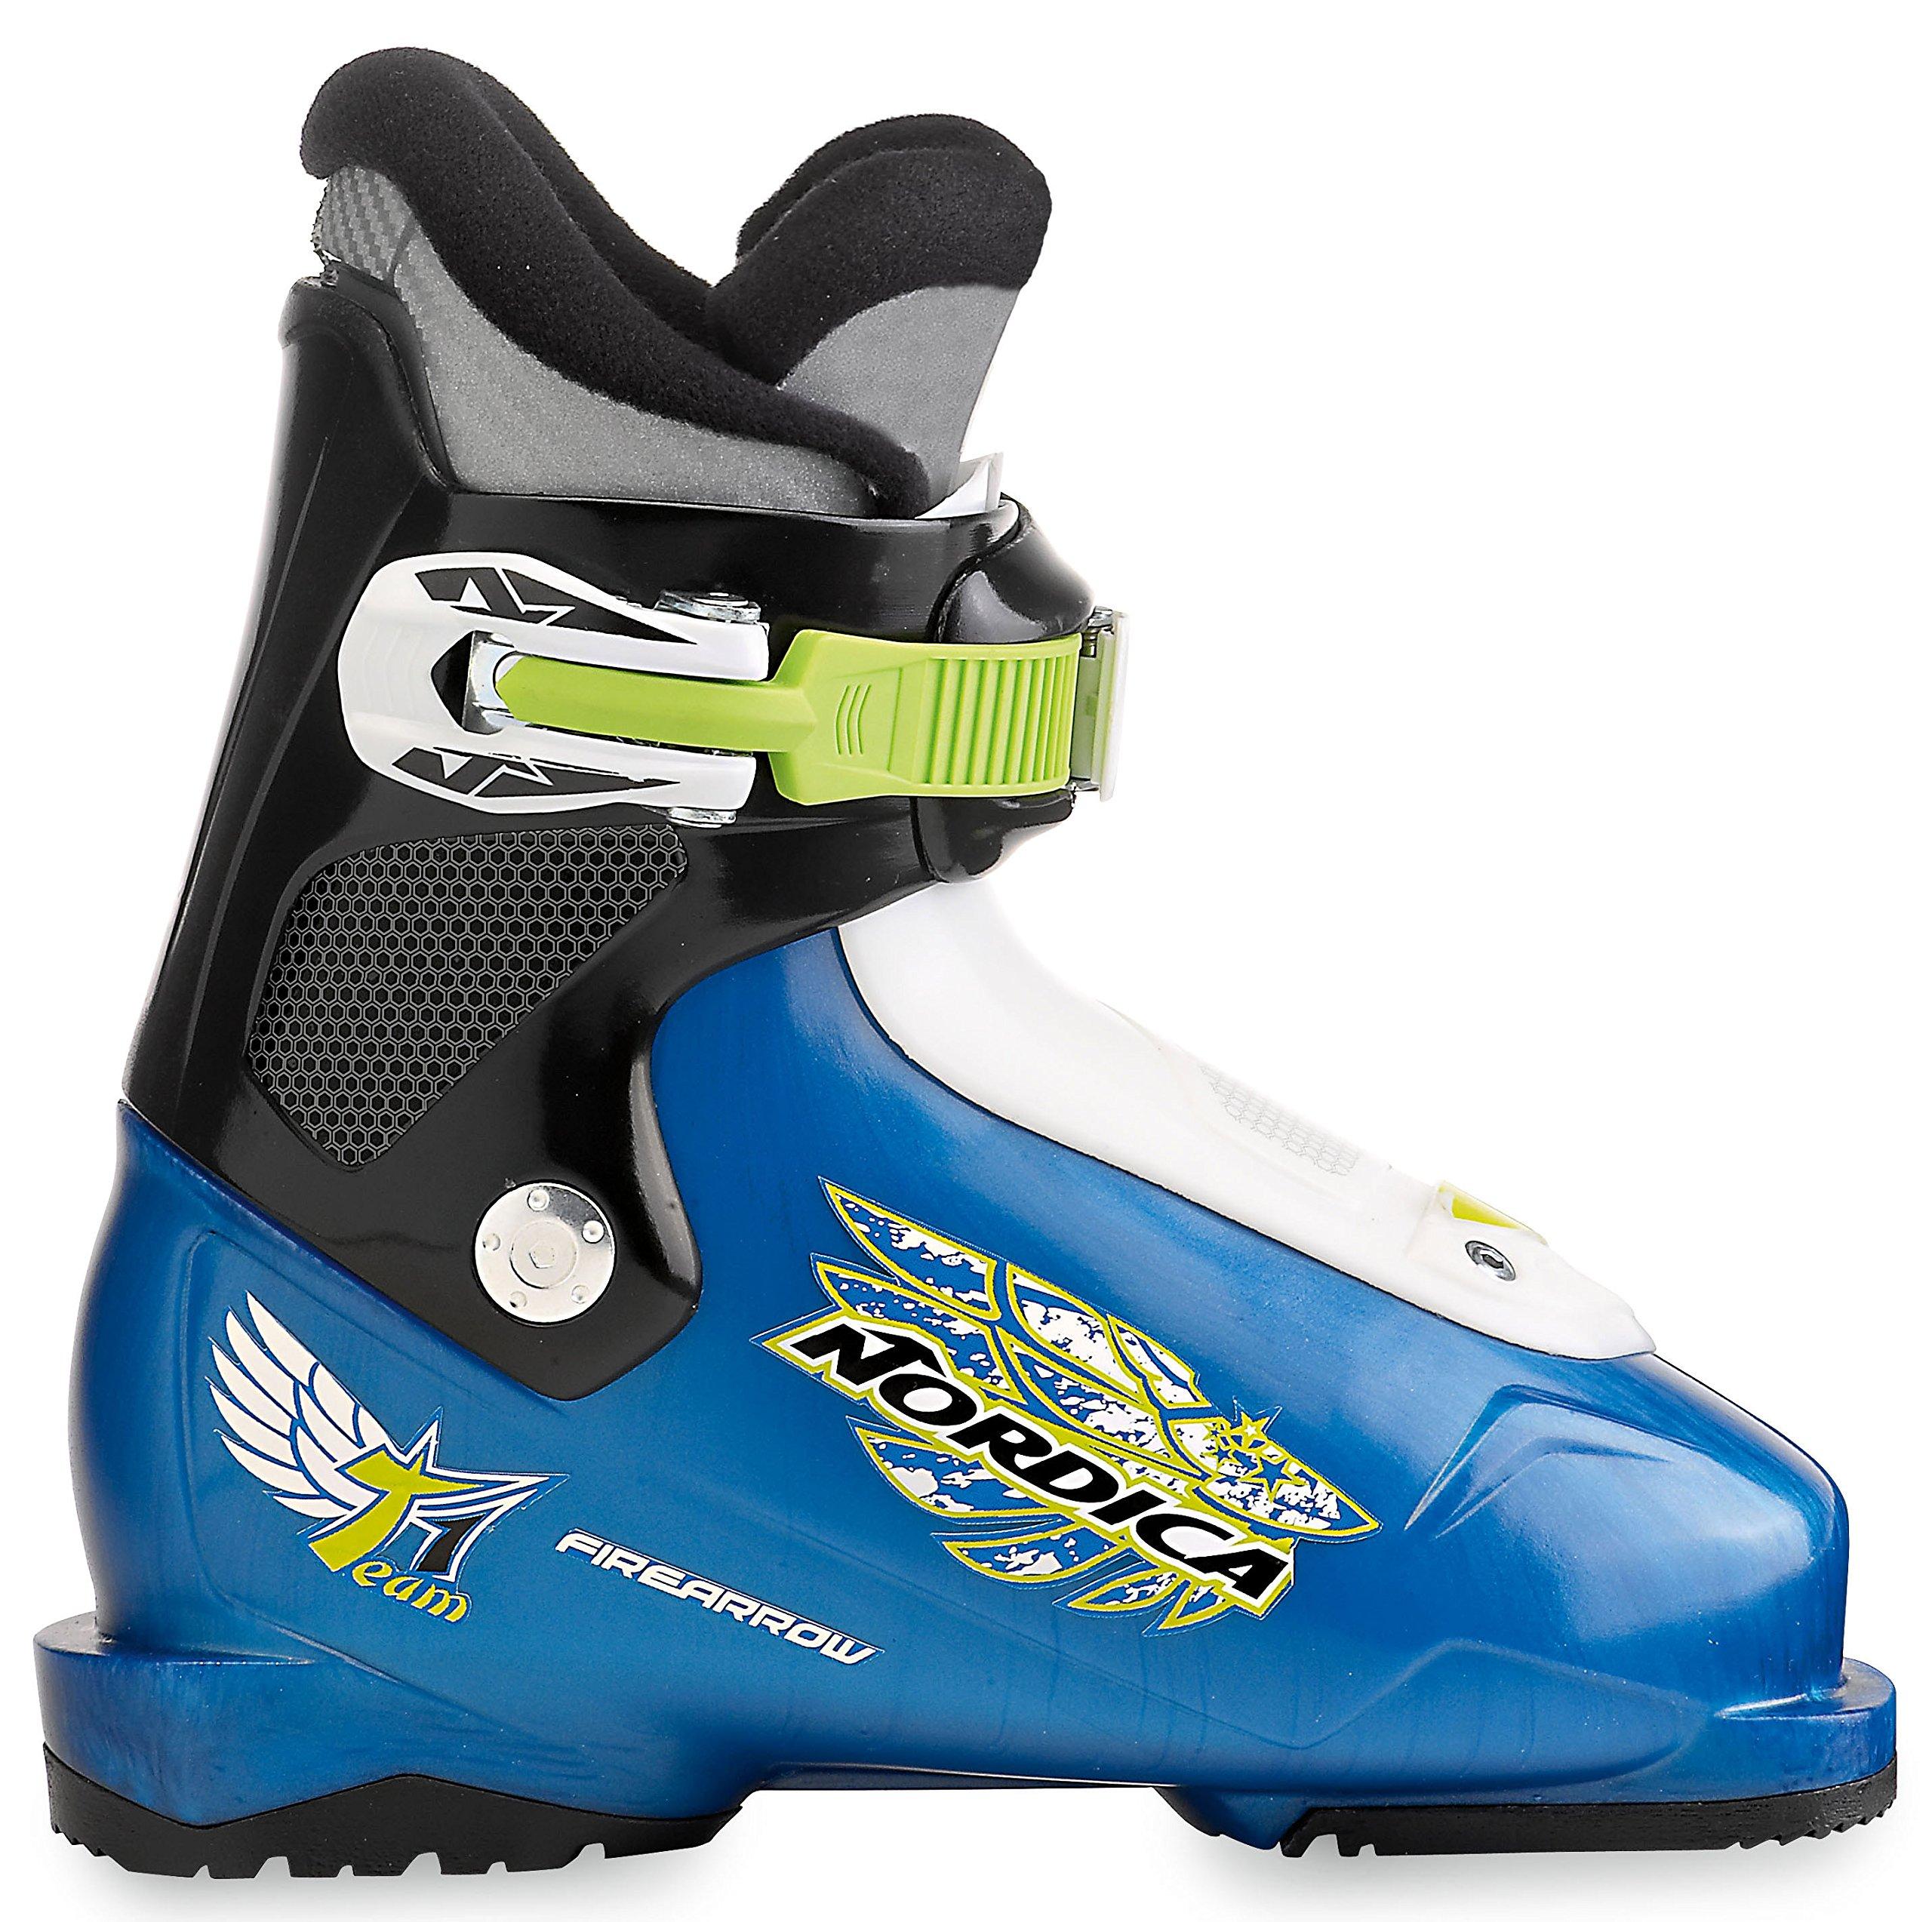 Nordica Firearrow Team 1 Ski Boot 2014, Light Blue/Black, 16.0 by Nordica